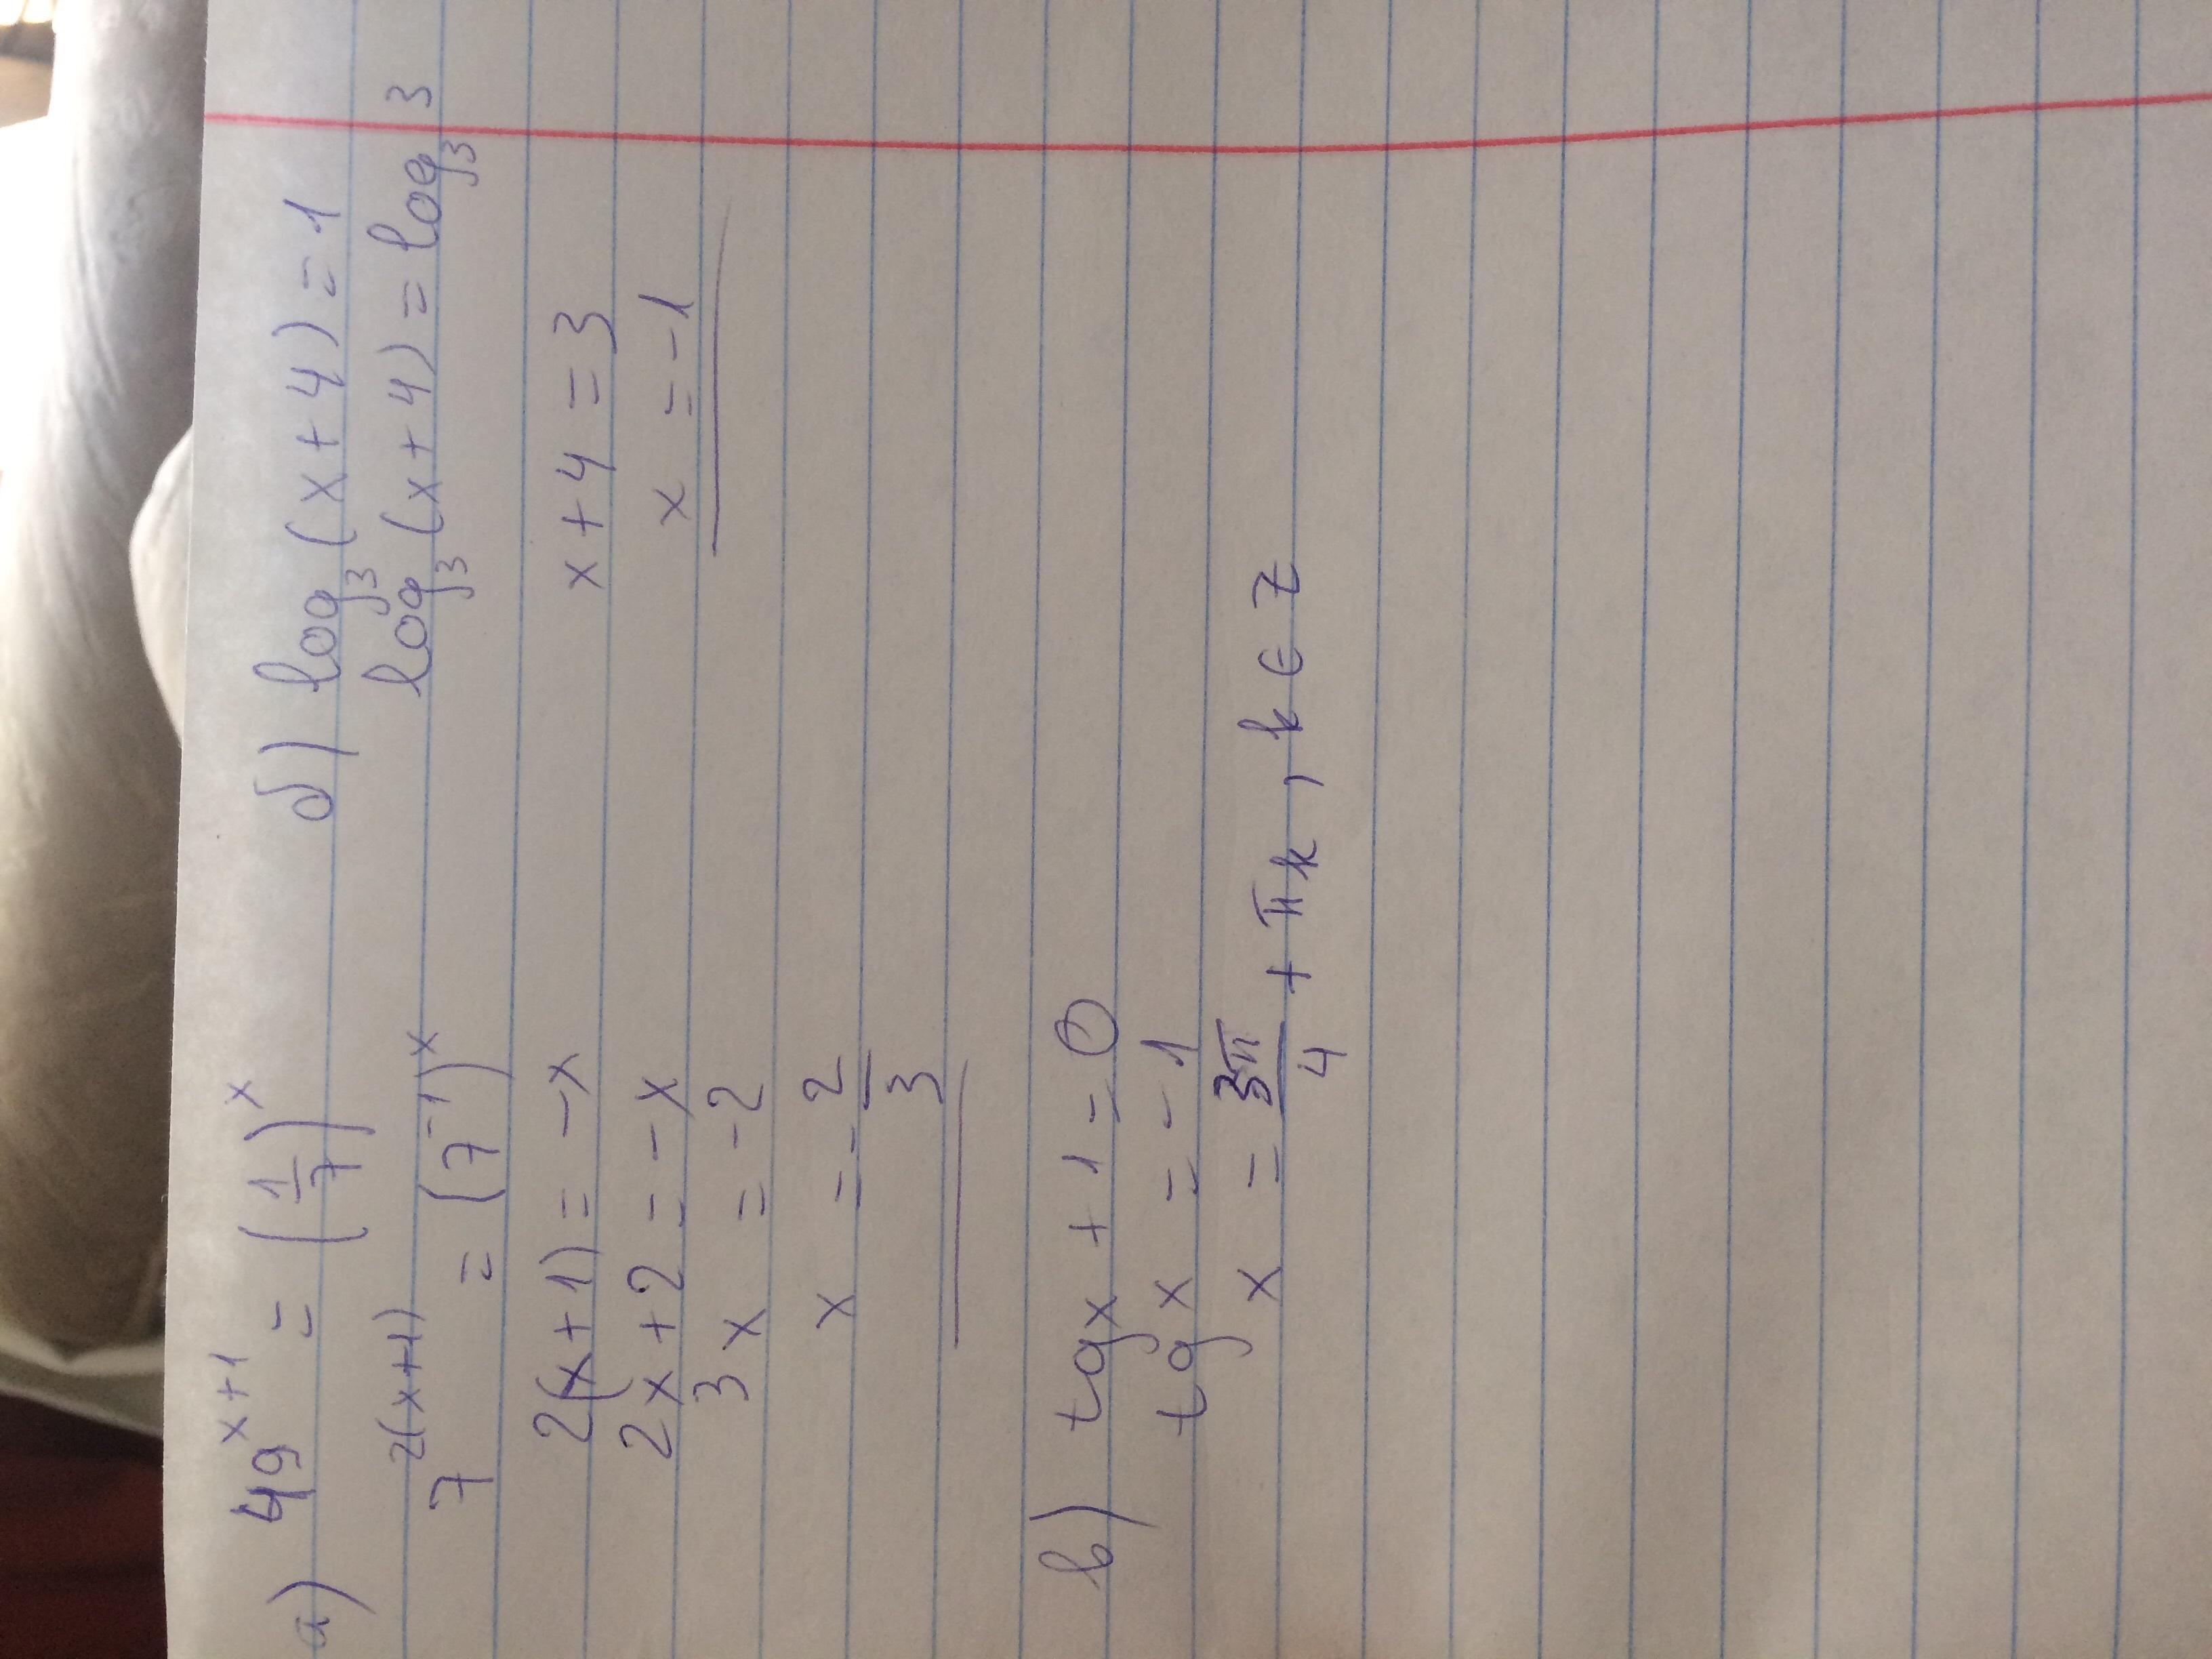 Ответ: а) 2/3<br>б) -1<br>в) х = 3пи/4 + пи к